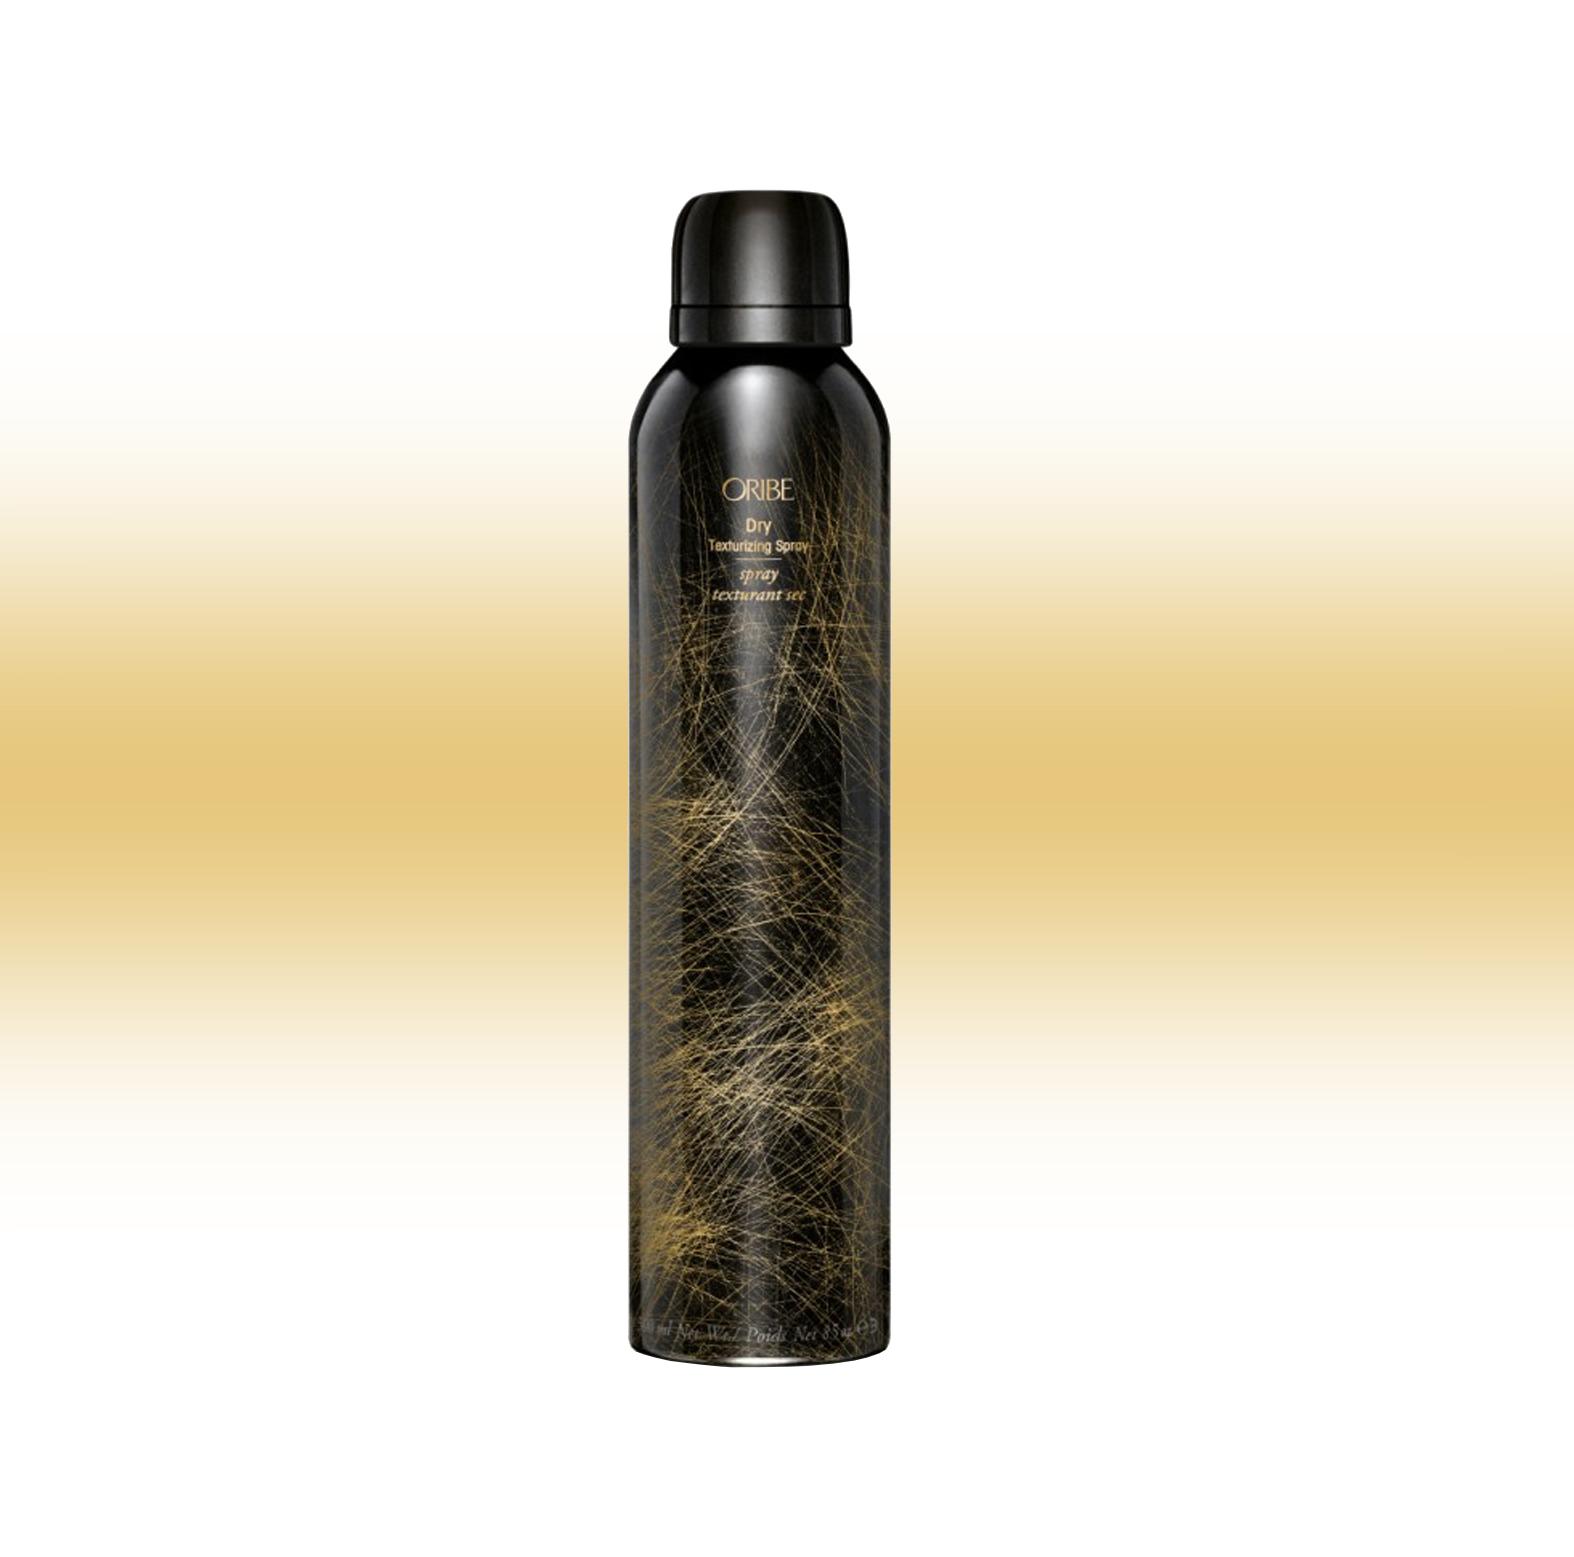 Спрей Dry Texturizing Spray, Oribe